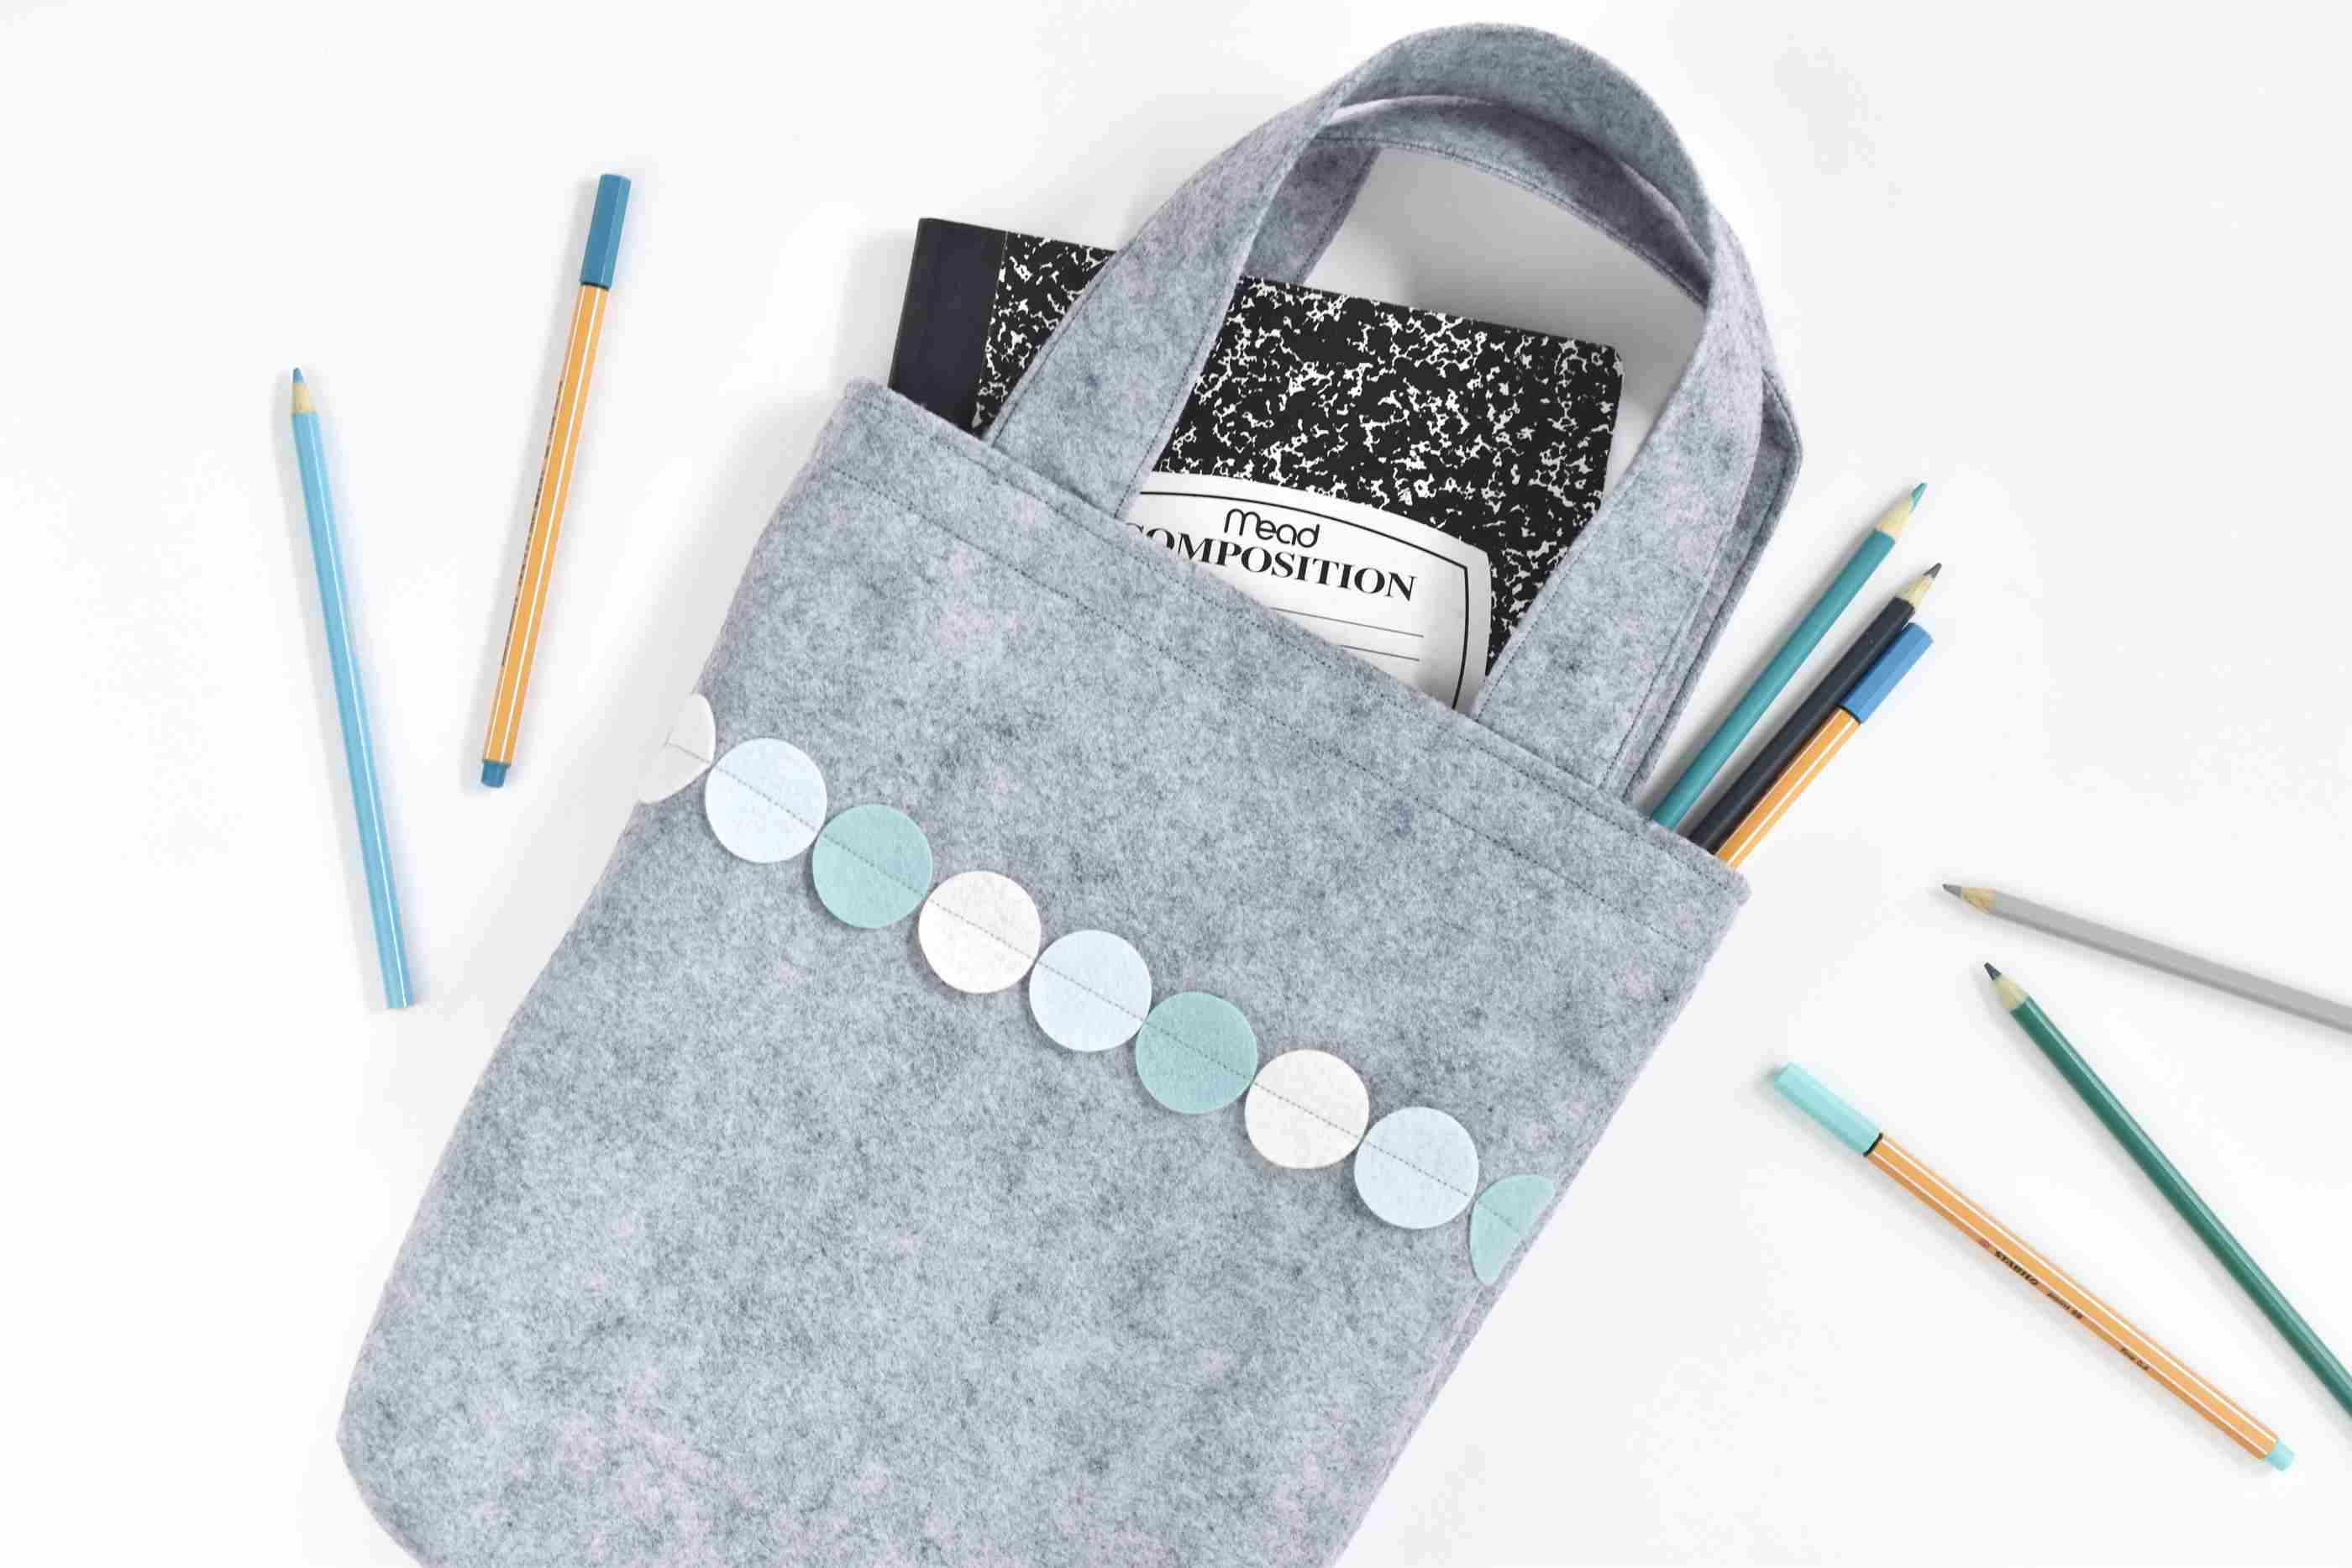 Sew an Easy Felt Tote Bag